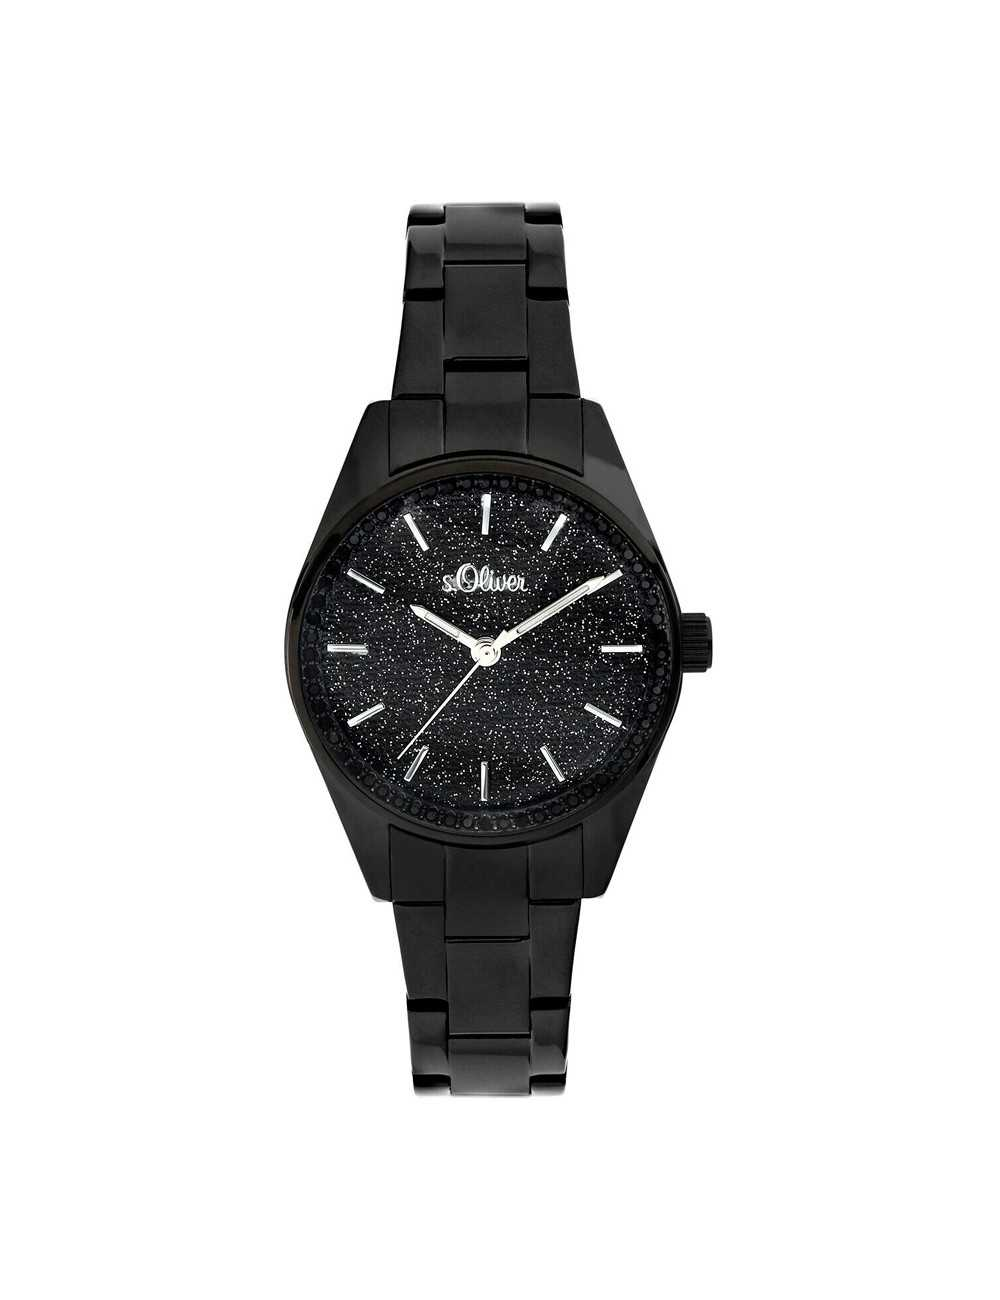 Dámske hodinky s.Oliver SO-3676-MQ